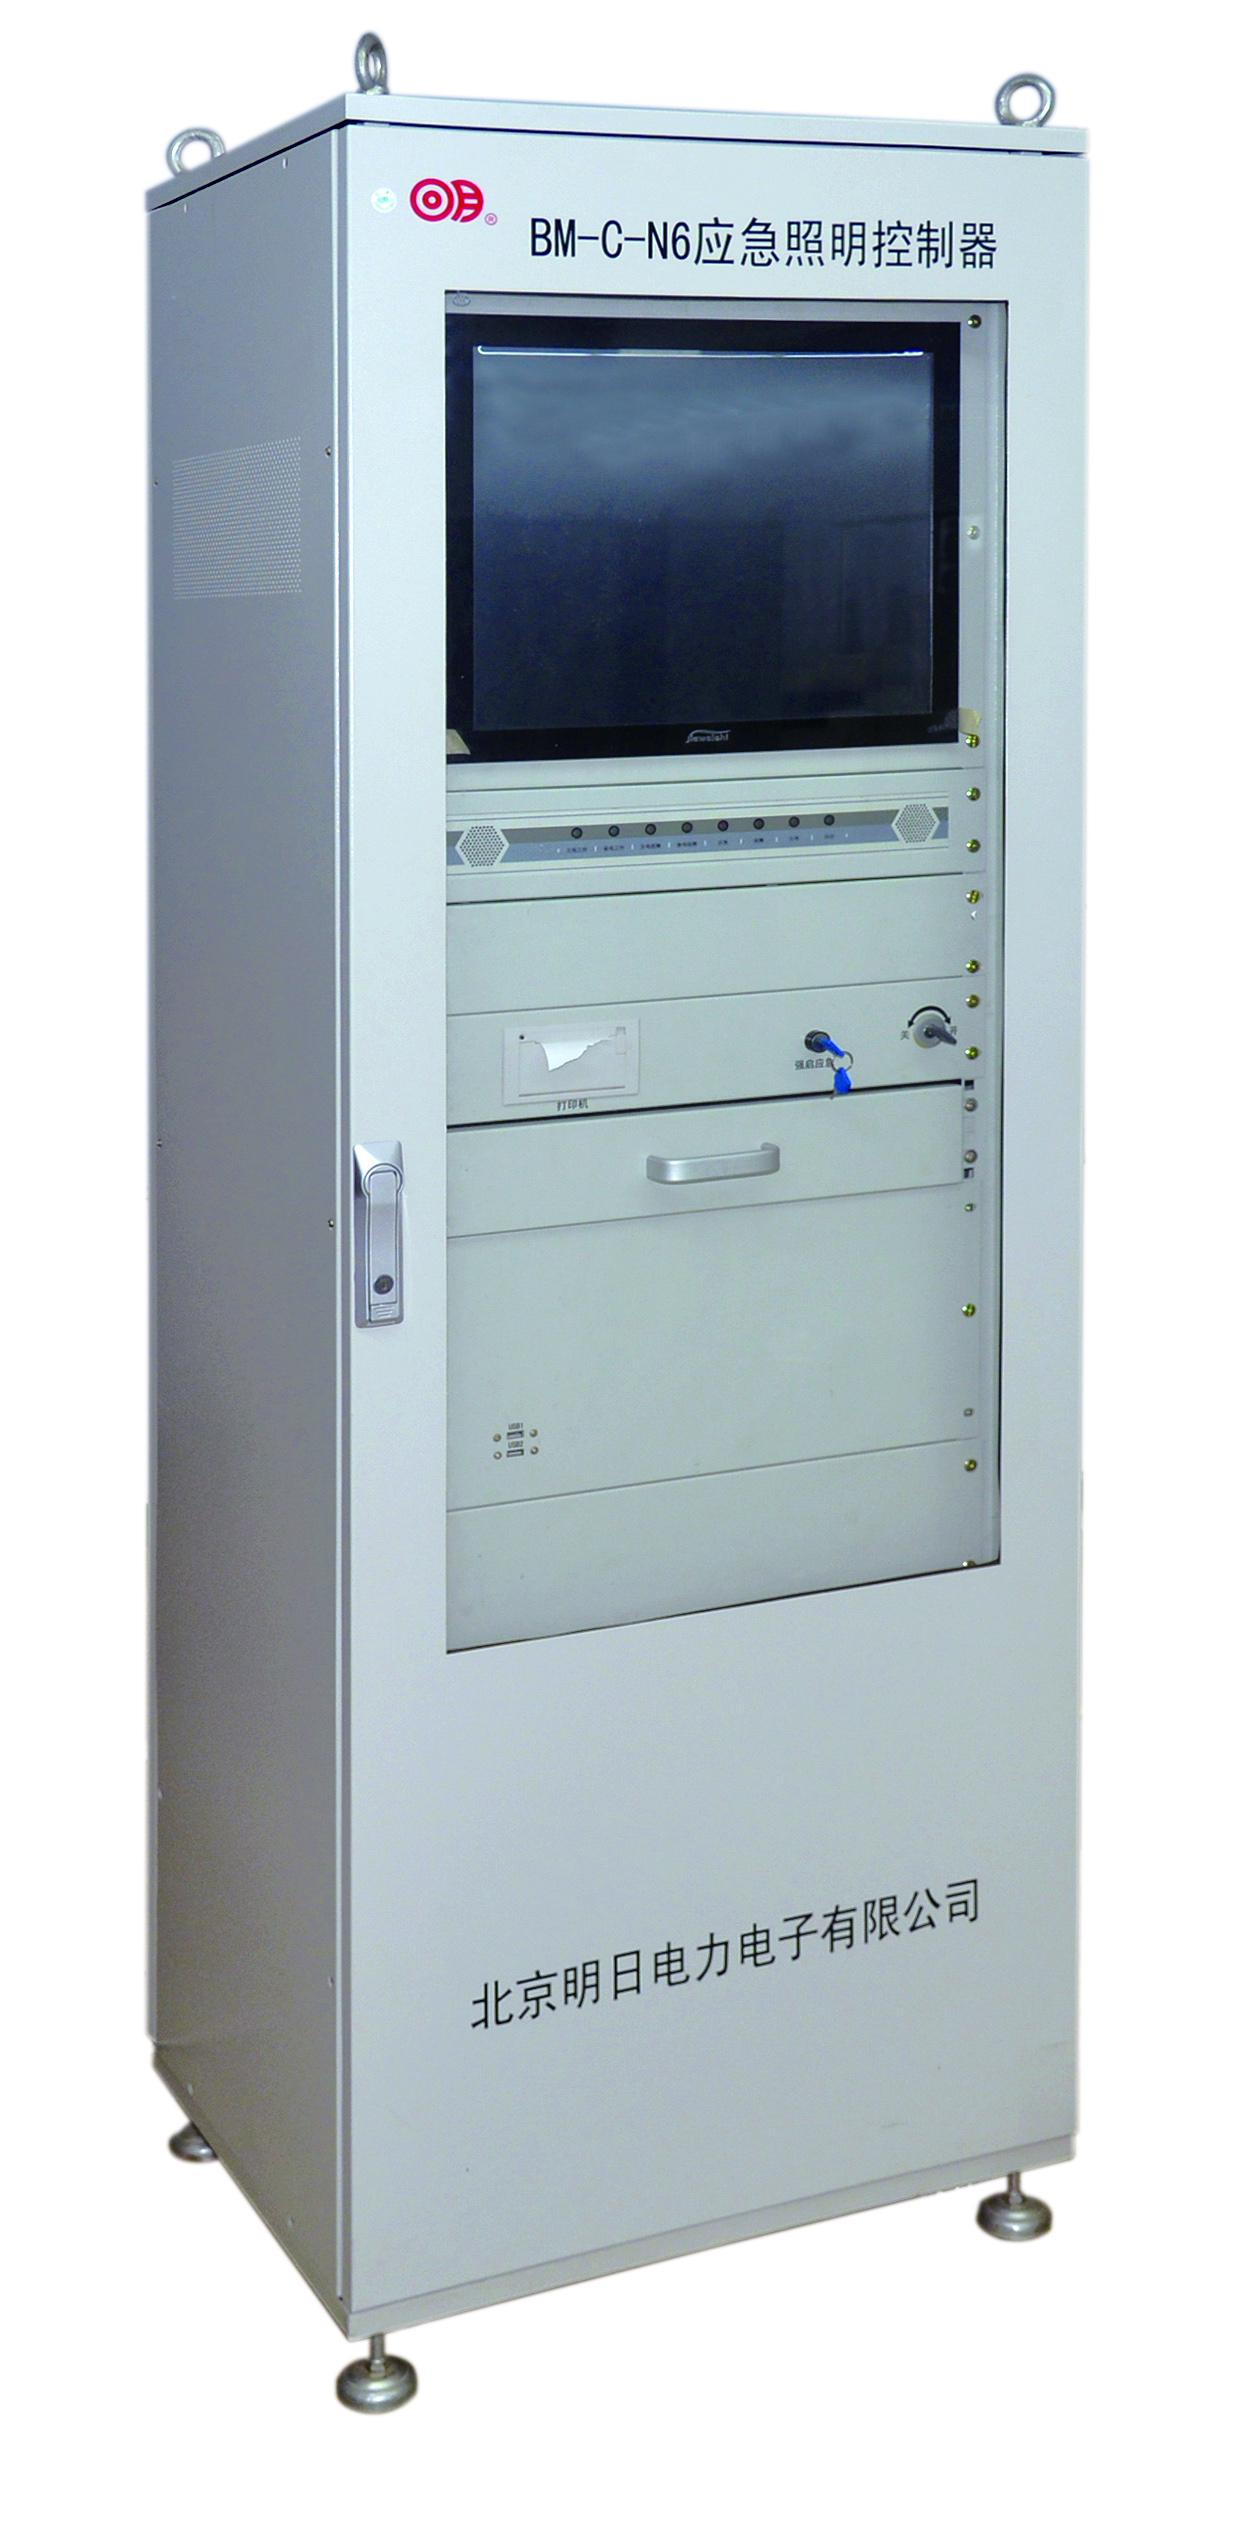 BMF智能疏散系统